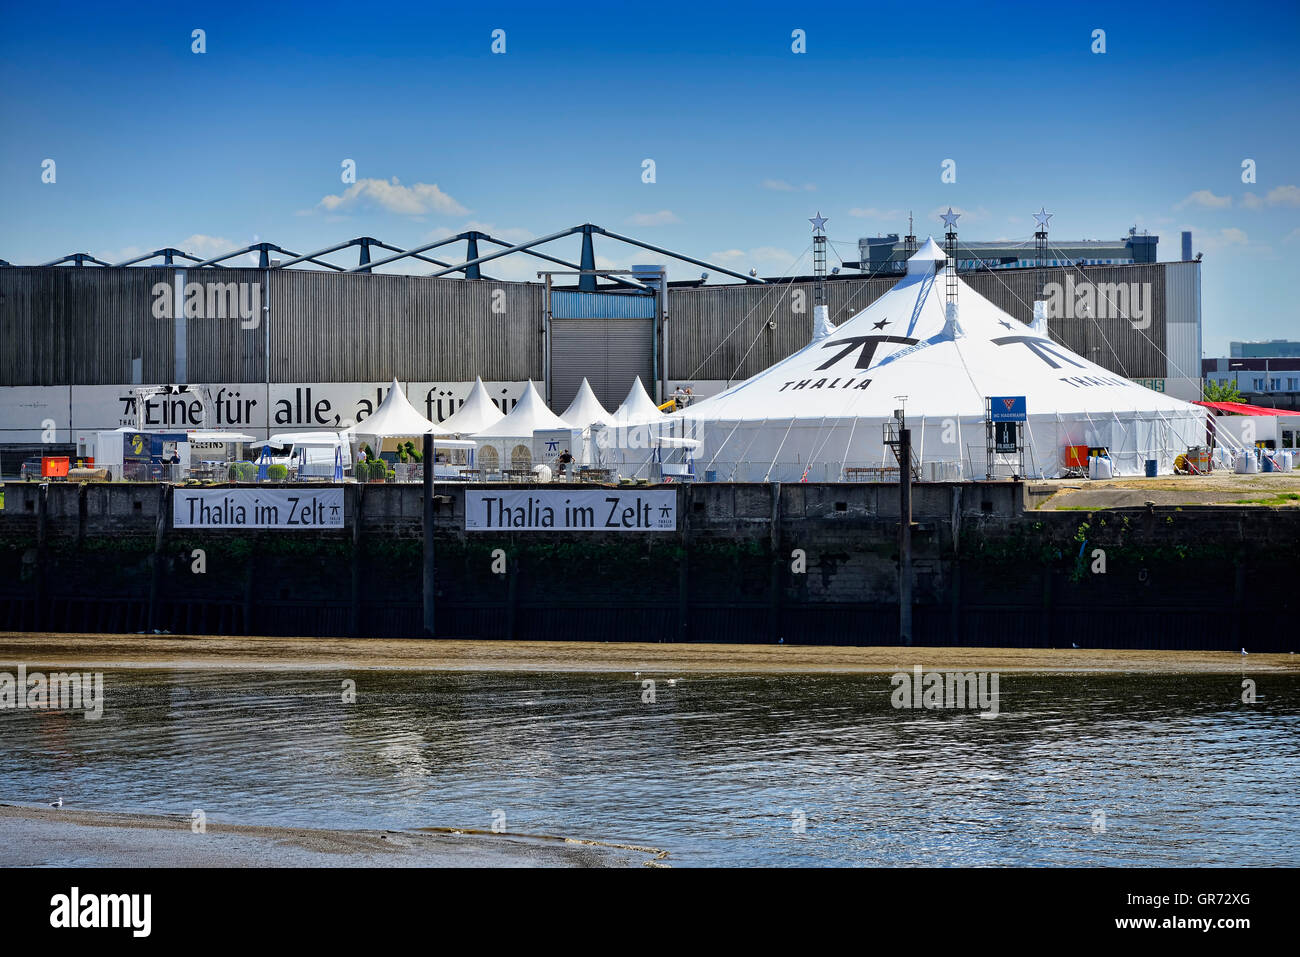 Thalia Im Zelt In Hamburg, Germany - Stock Image